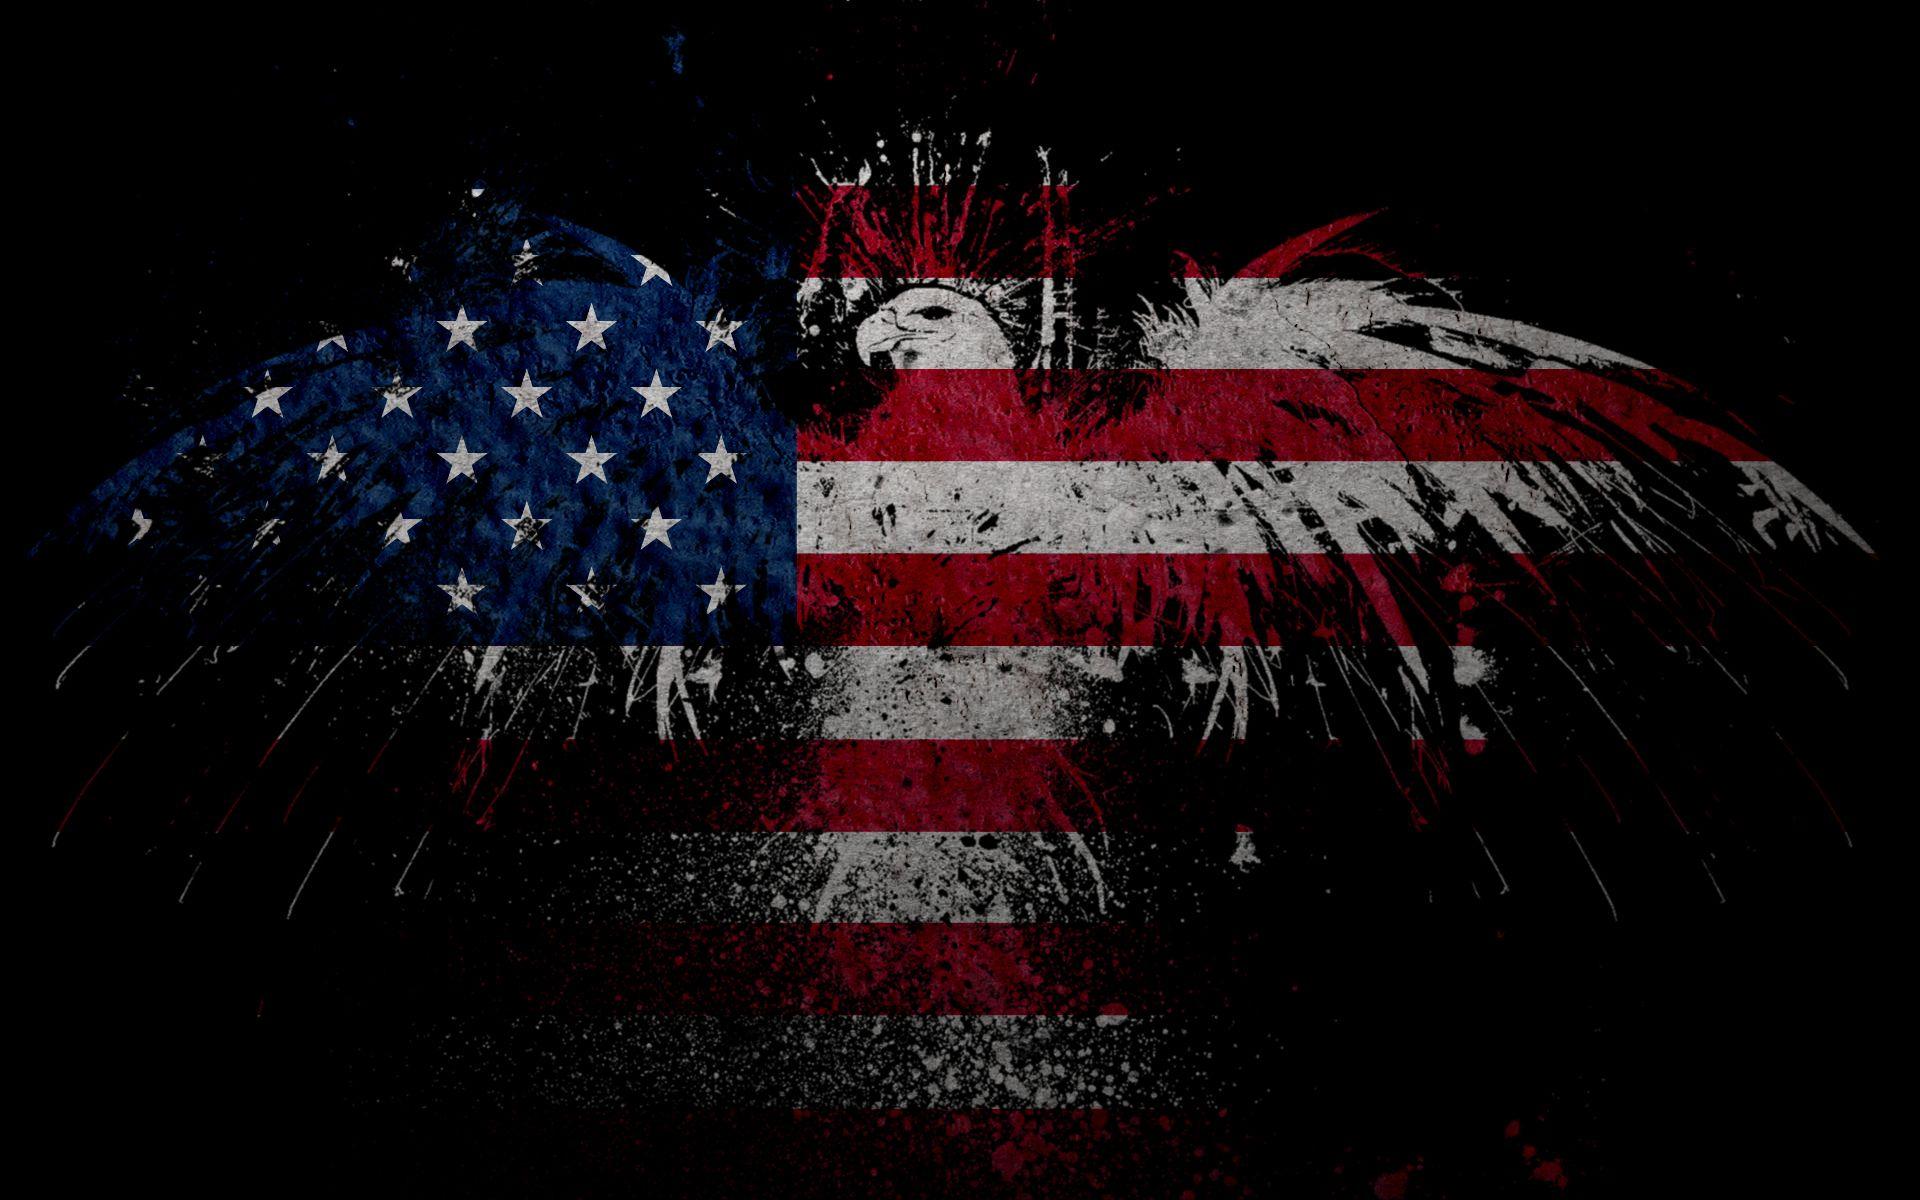 USA iPhone 5 Wallpaper by vmitchell85.deviantart.com on ...